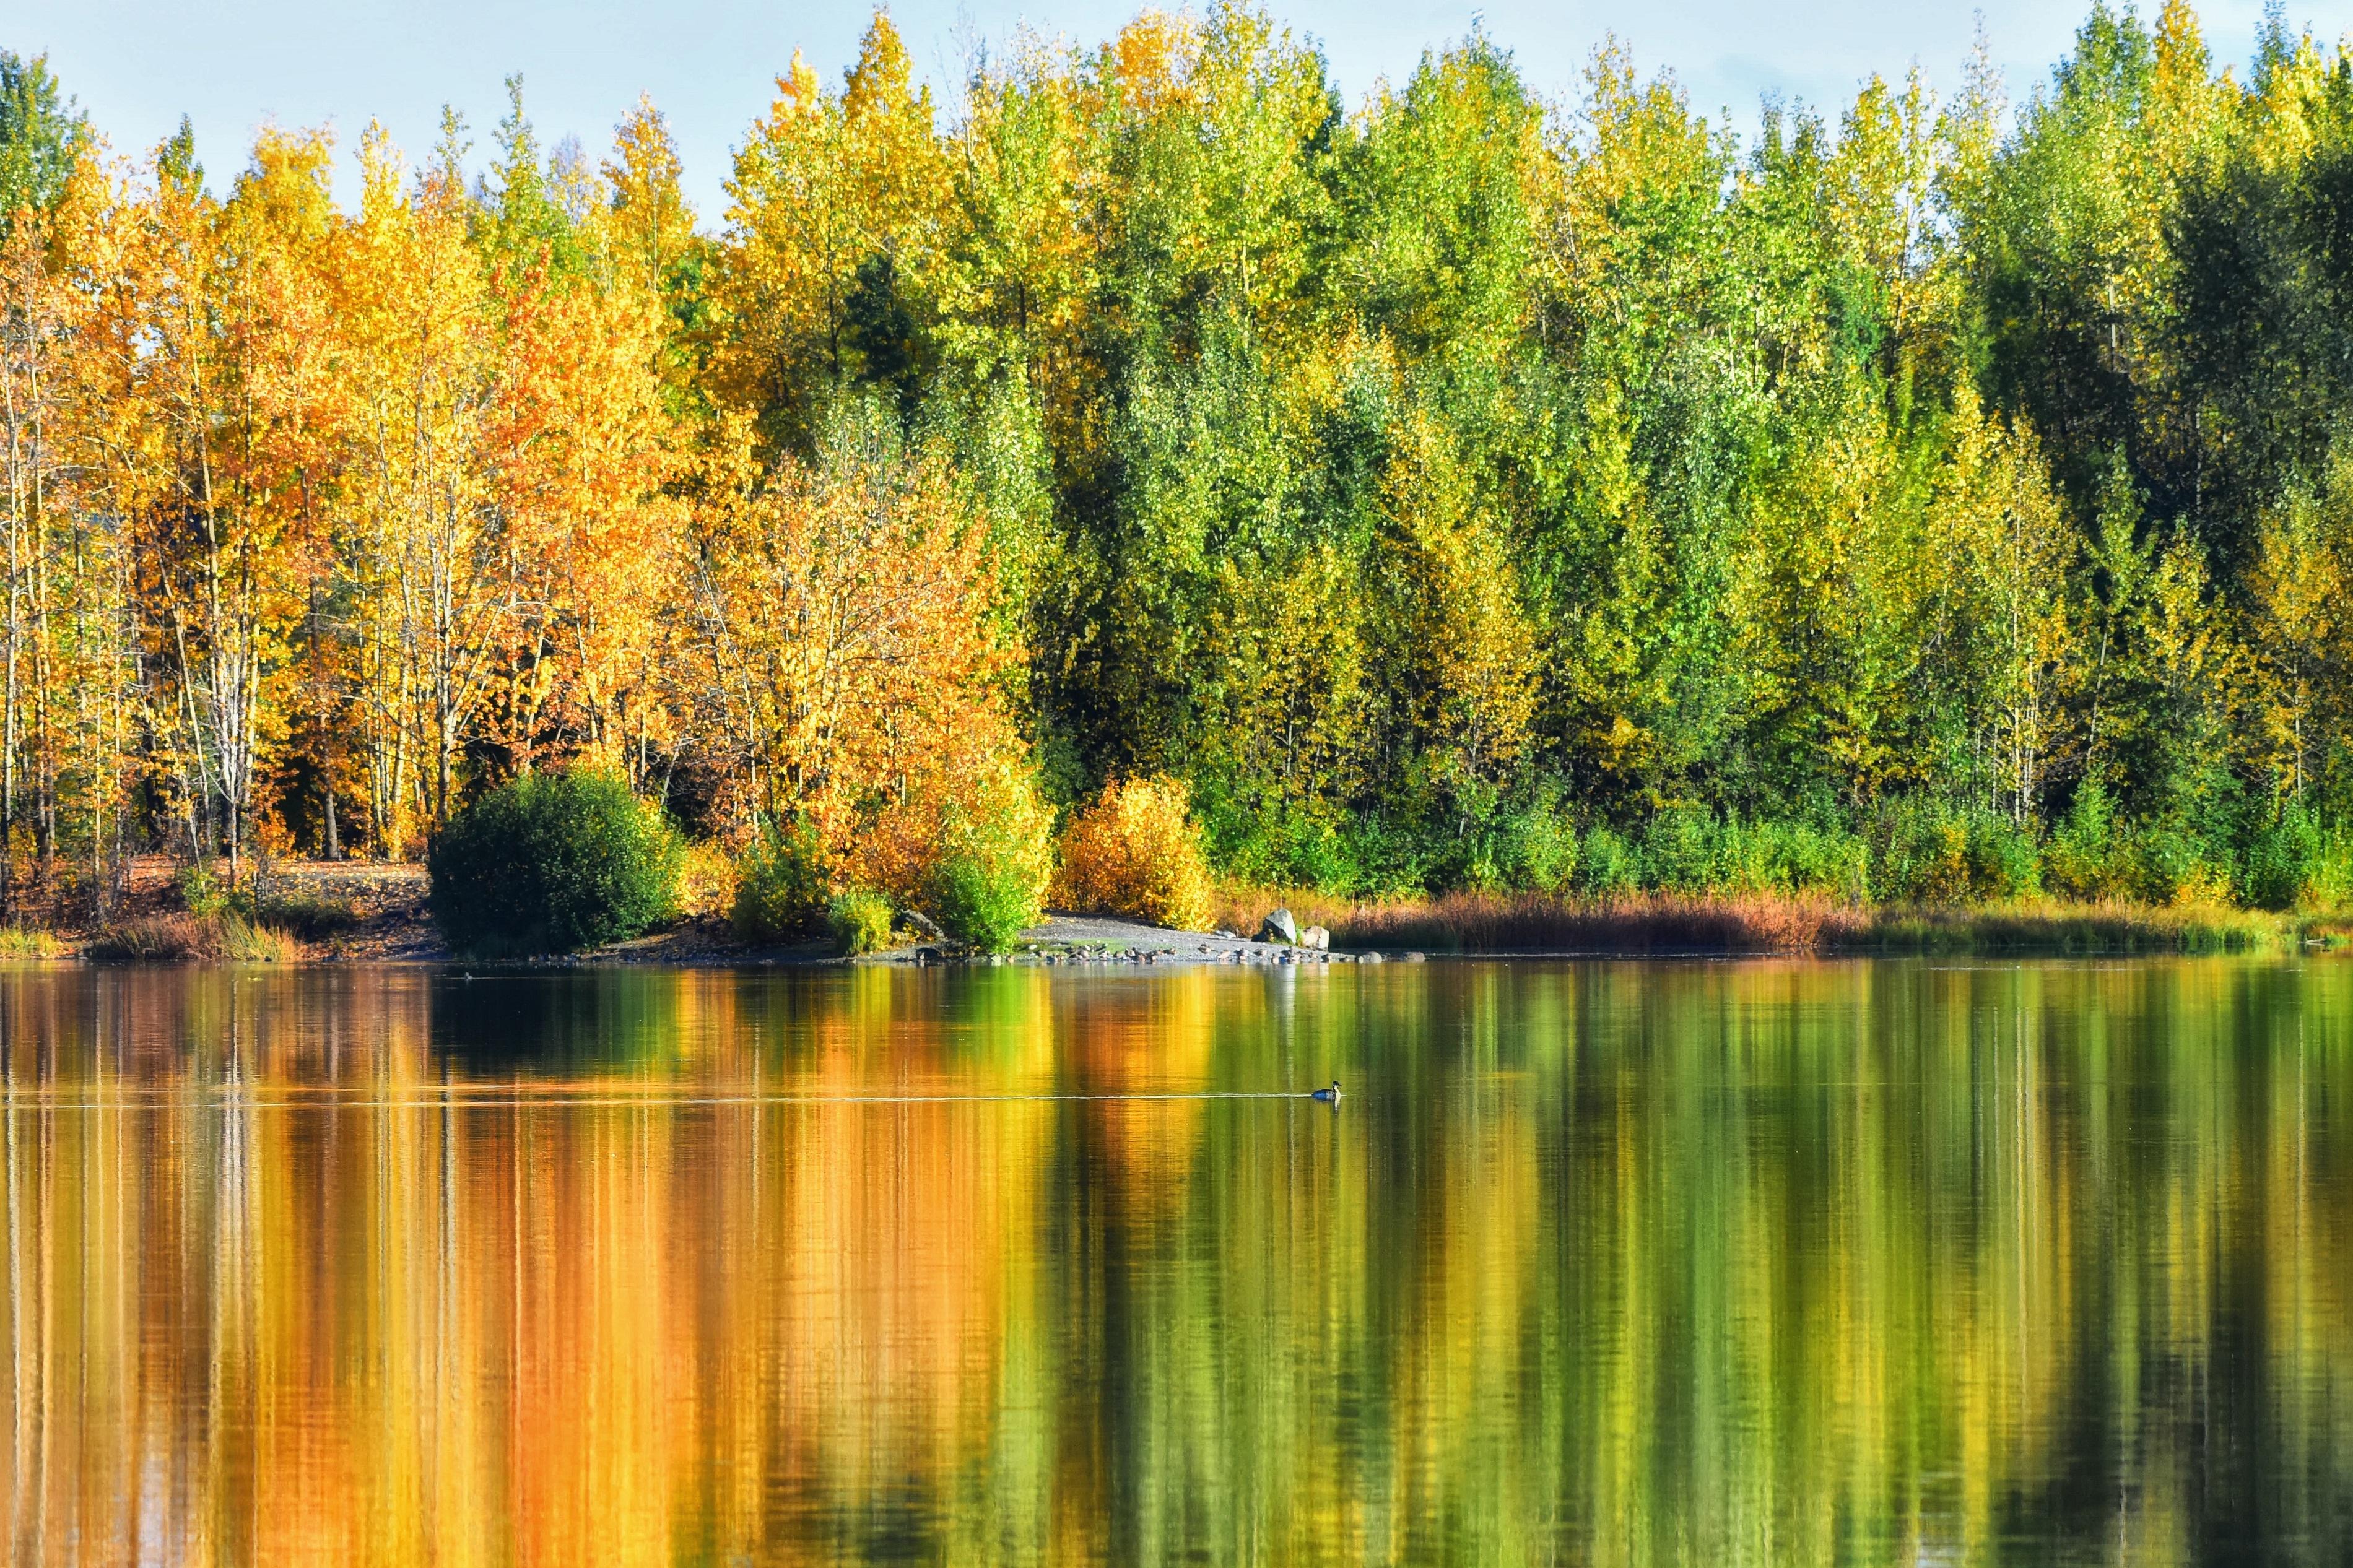 Free Images : landscape, tree, water, wilderness, meadow, leaf, lake ...